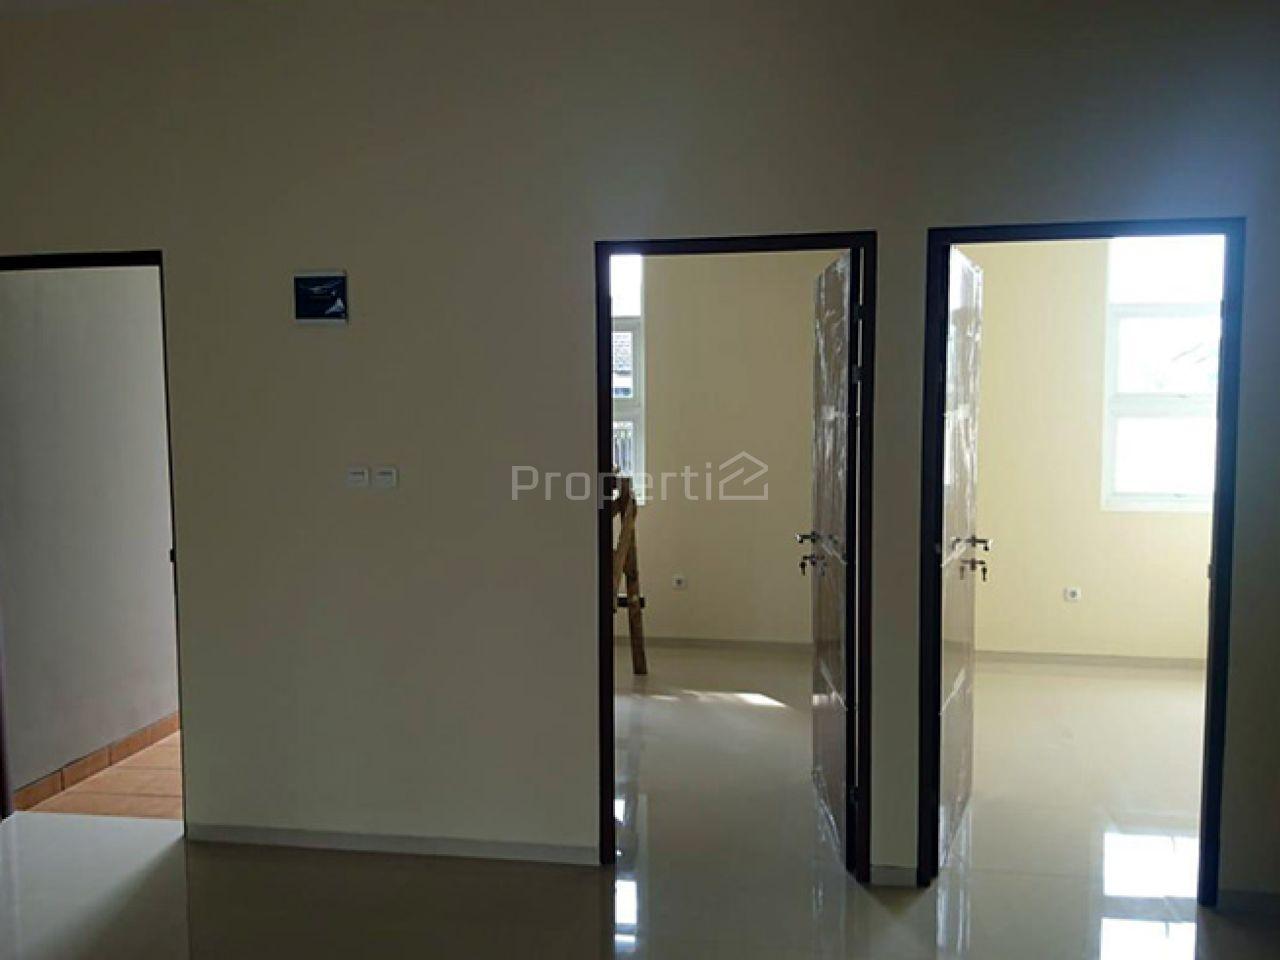 Rumah Baru Cisaranten Unit 3 di Sekitar Arcamanik, Kota Bandung